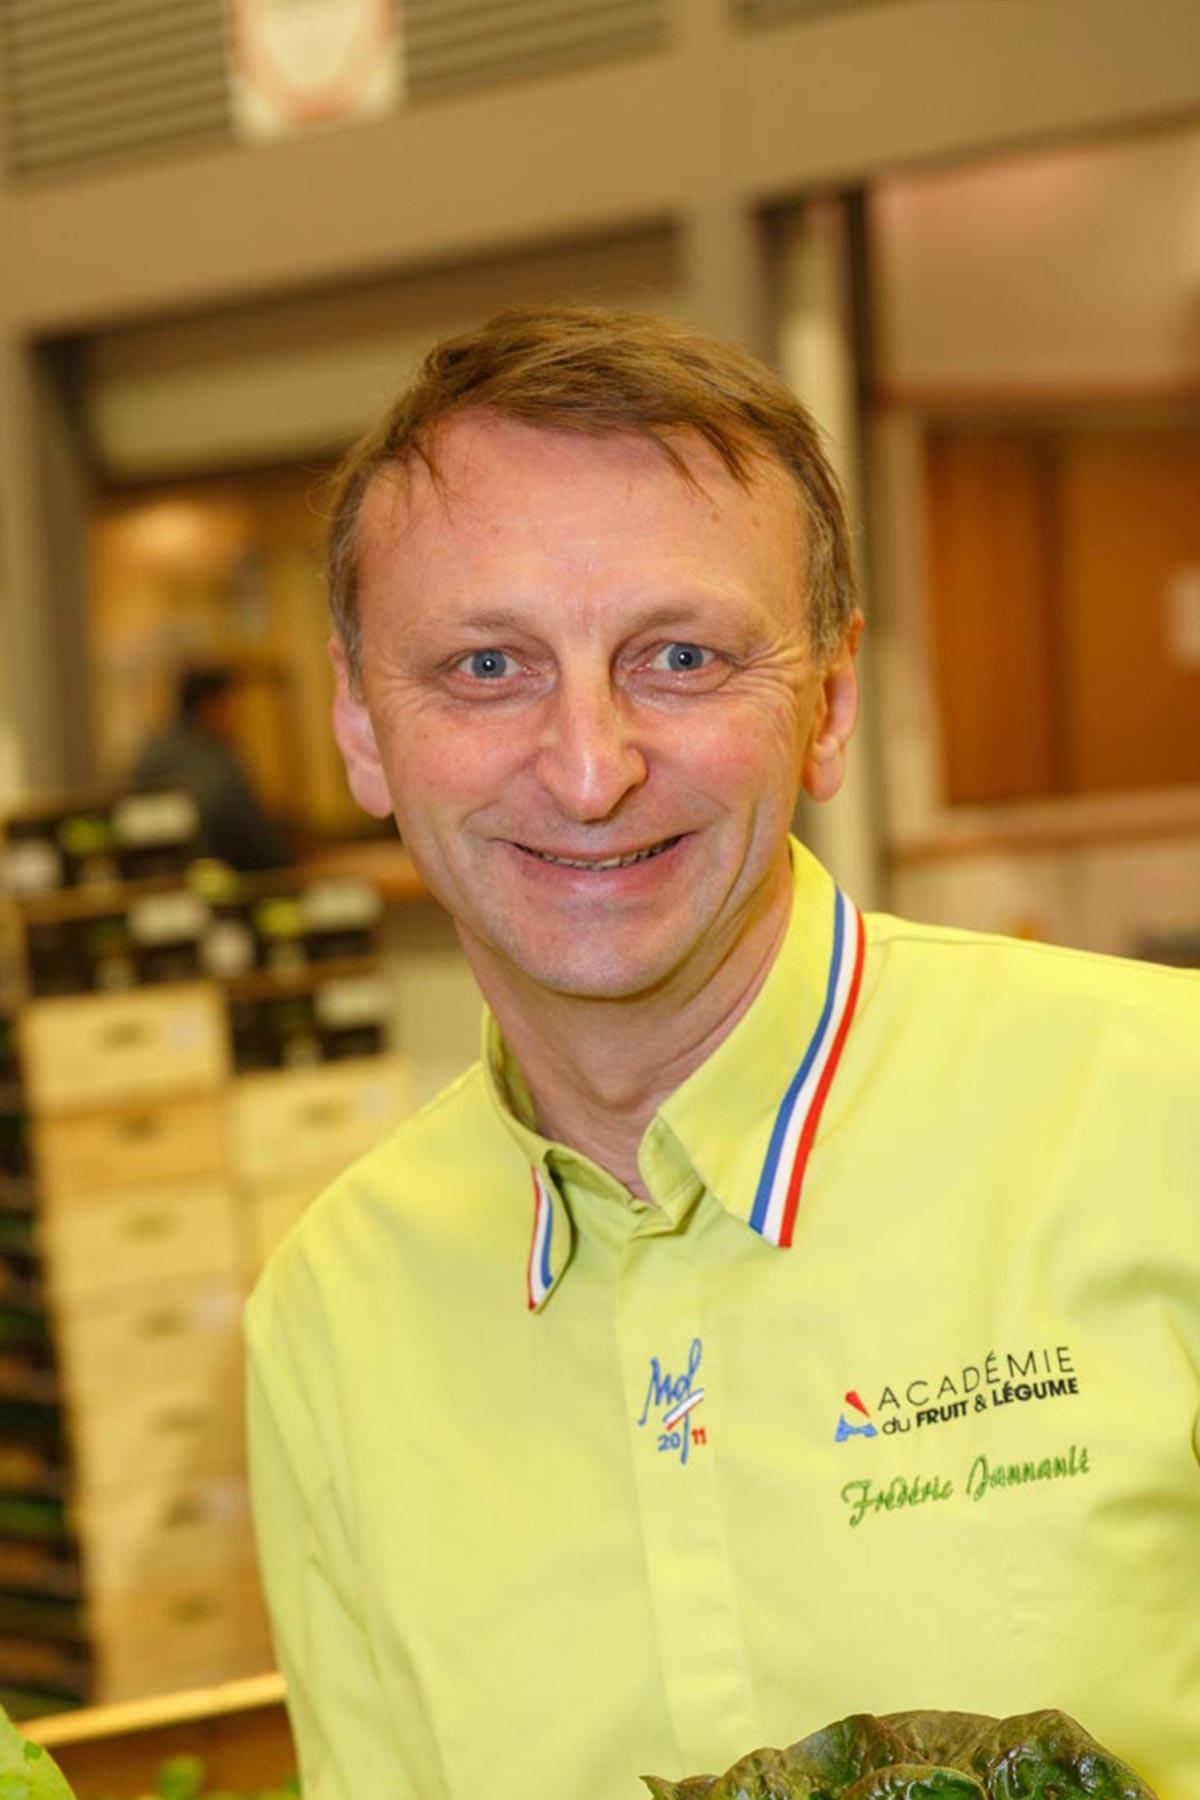 JAUNAULT Frédéric